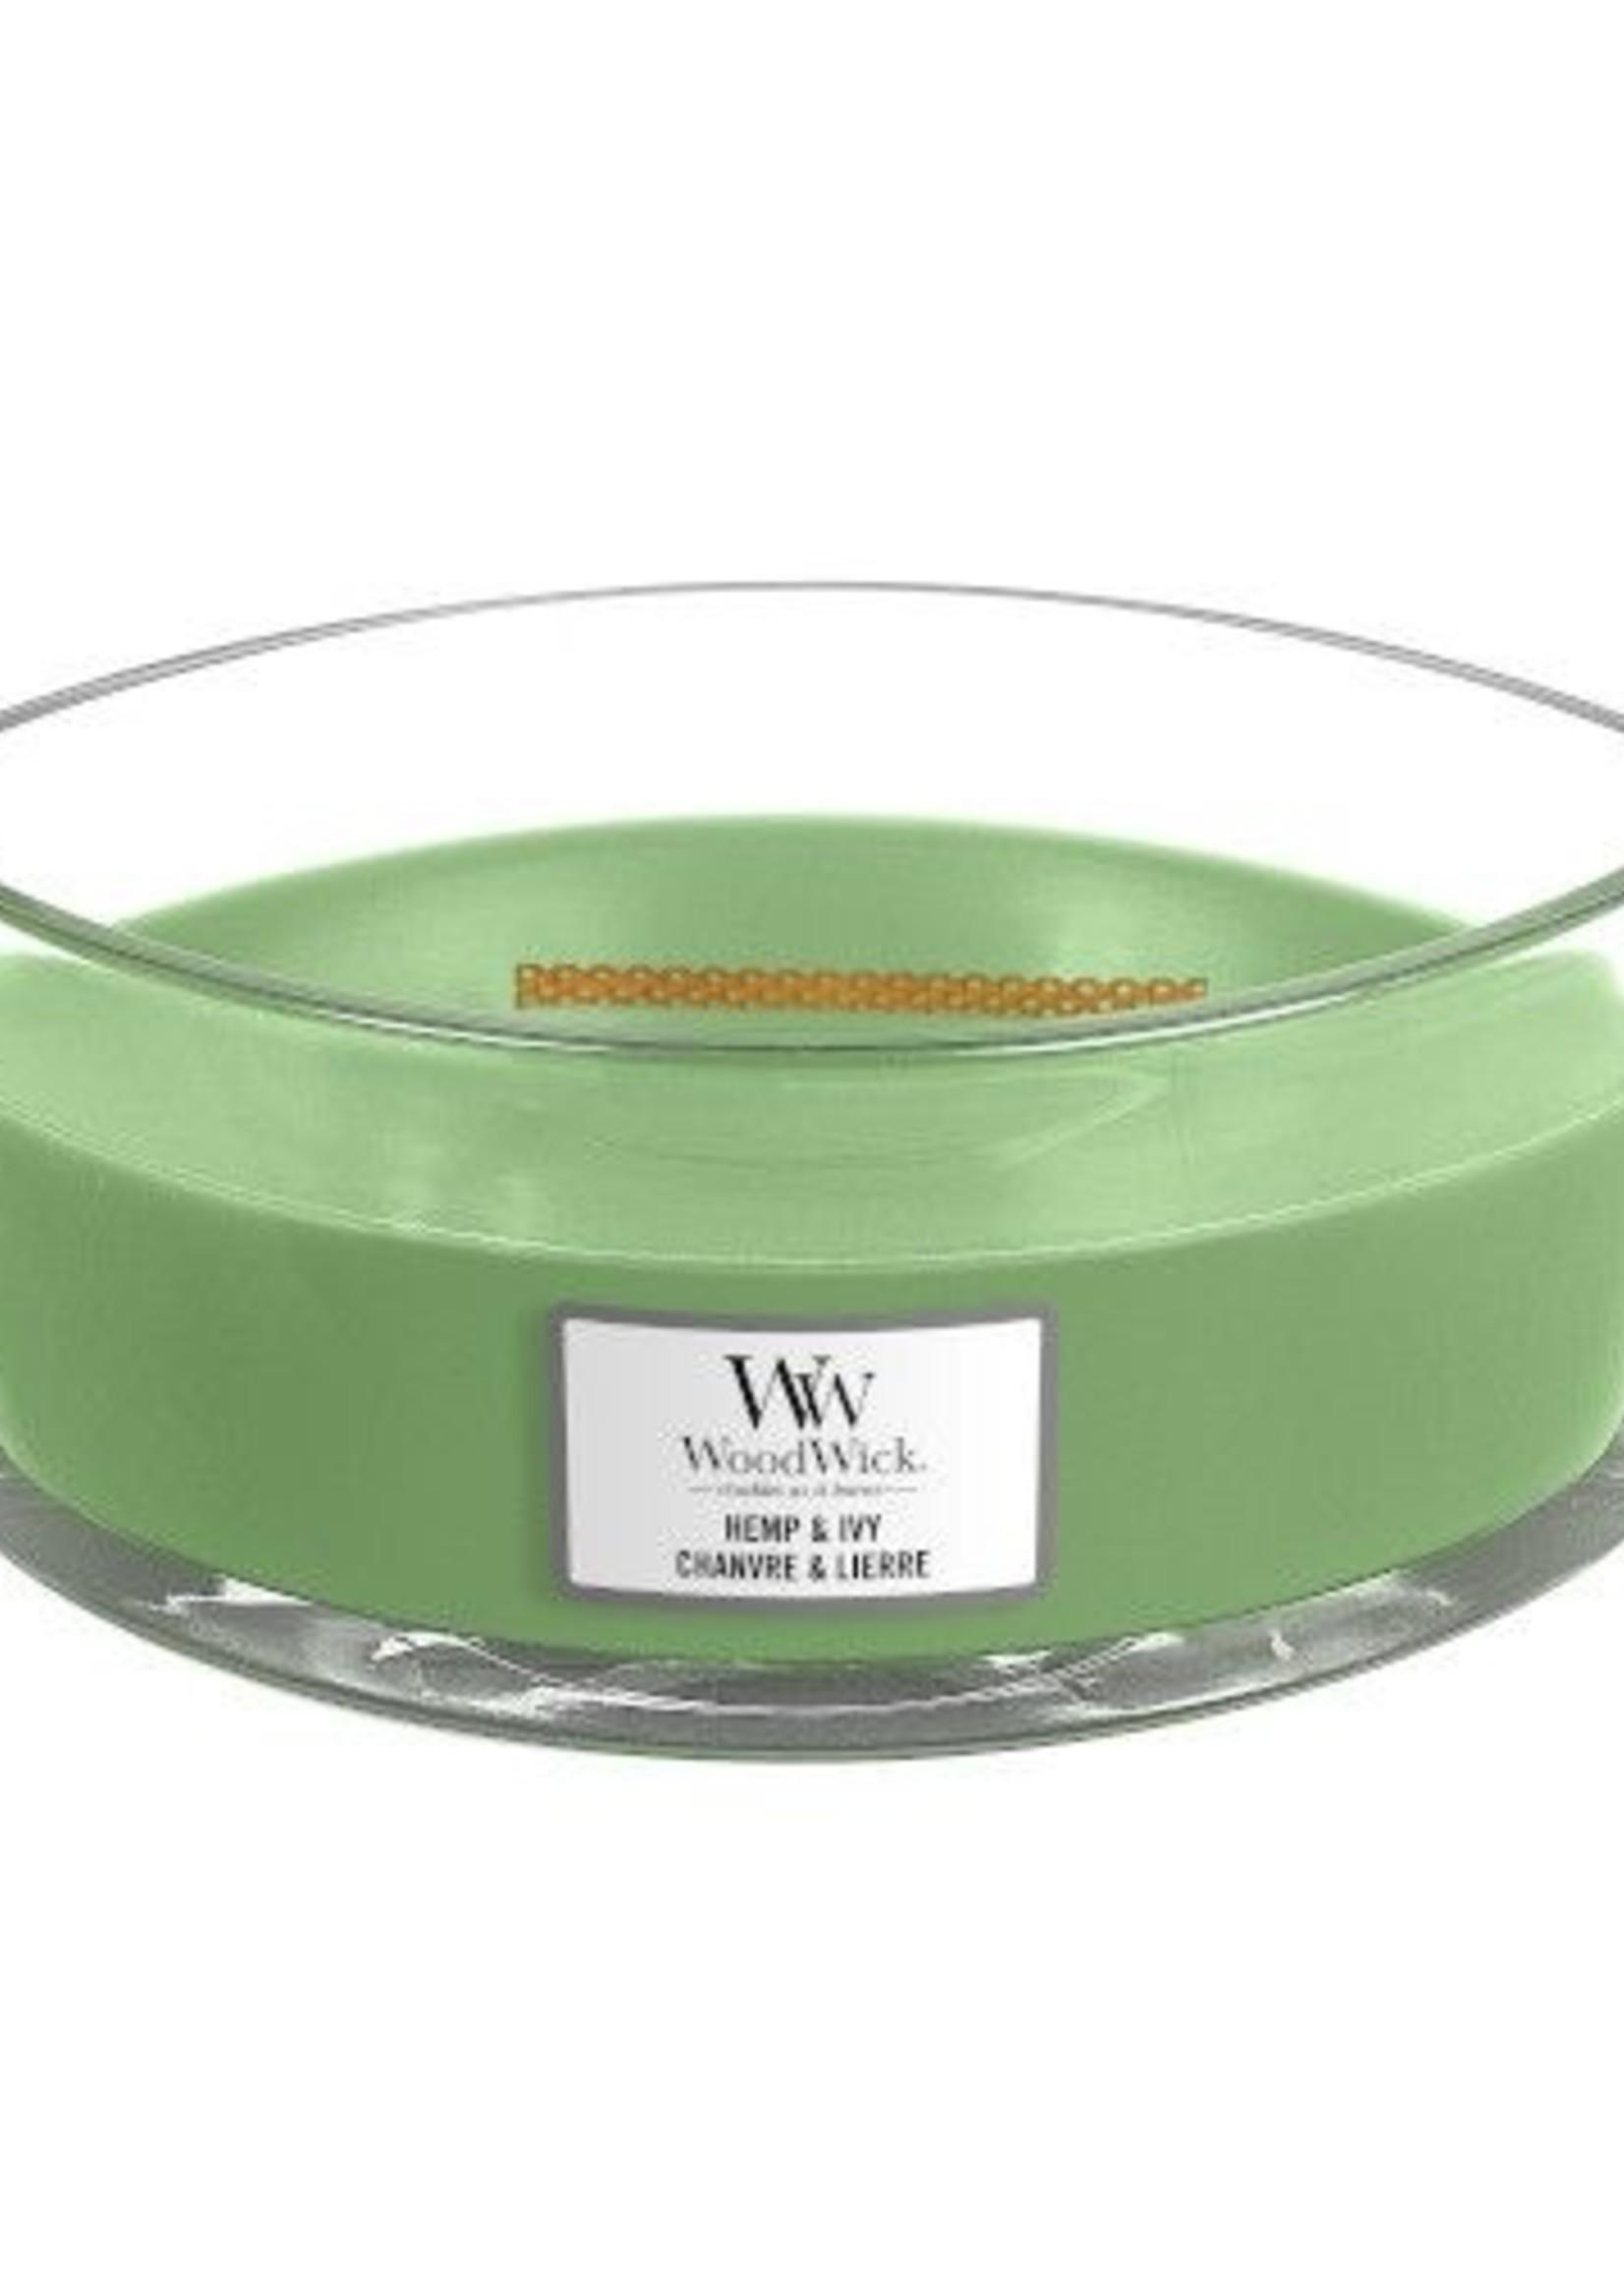 Woodwick Woodwick Hemp & Ivy Ellipse Candle